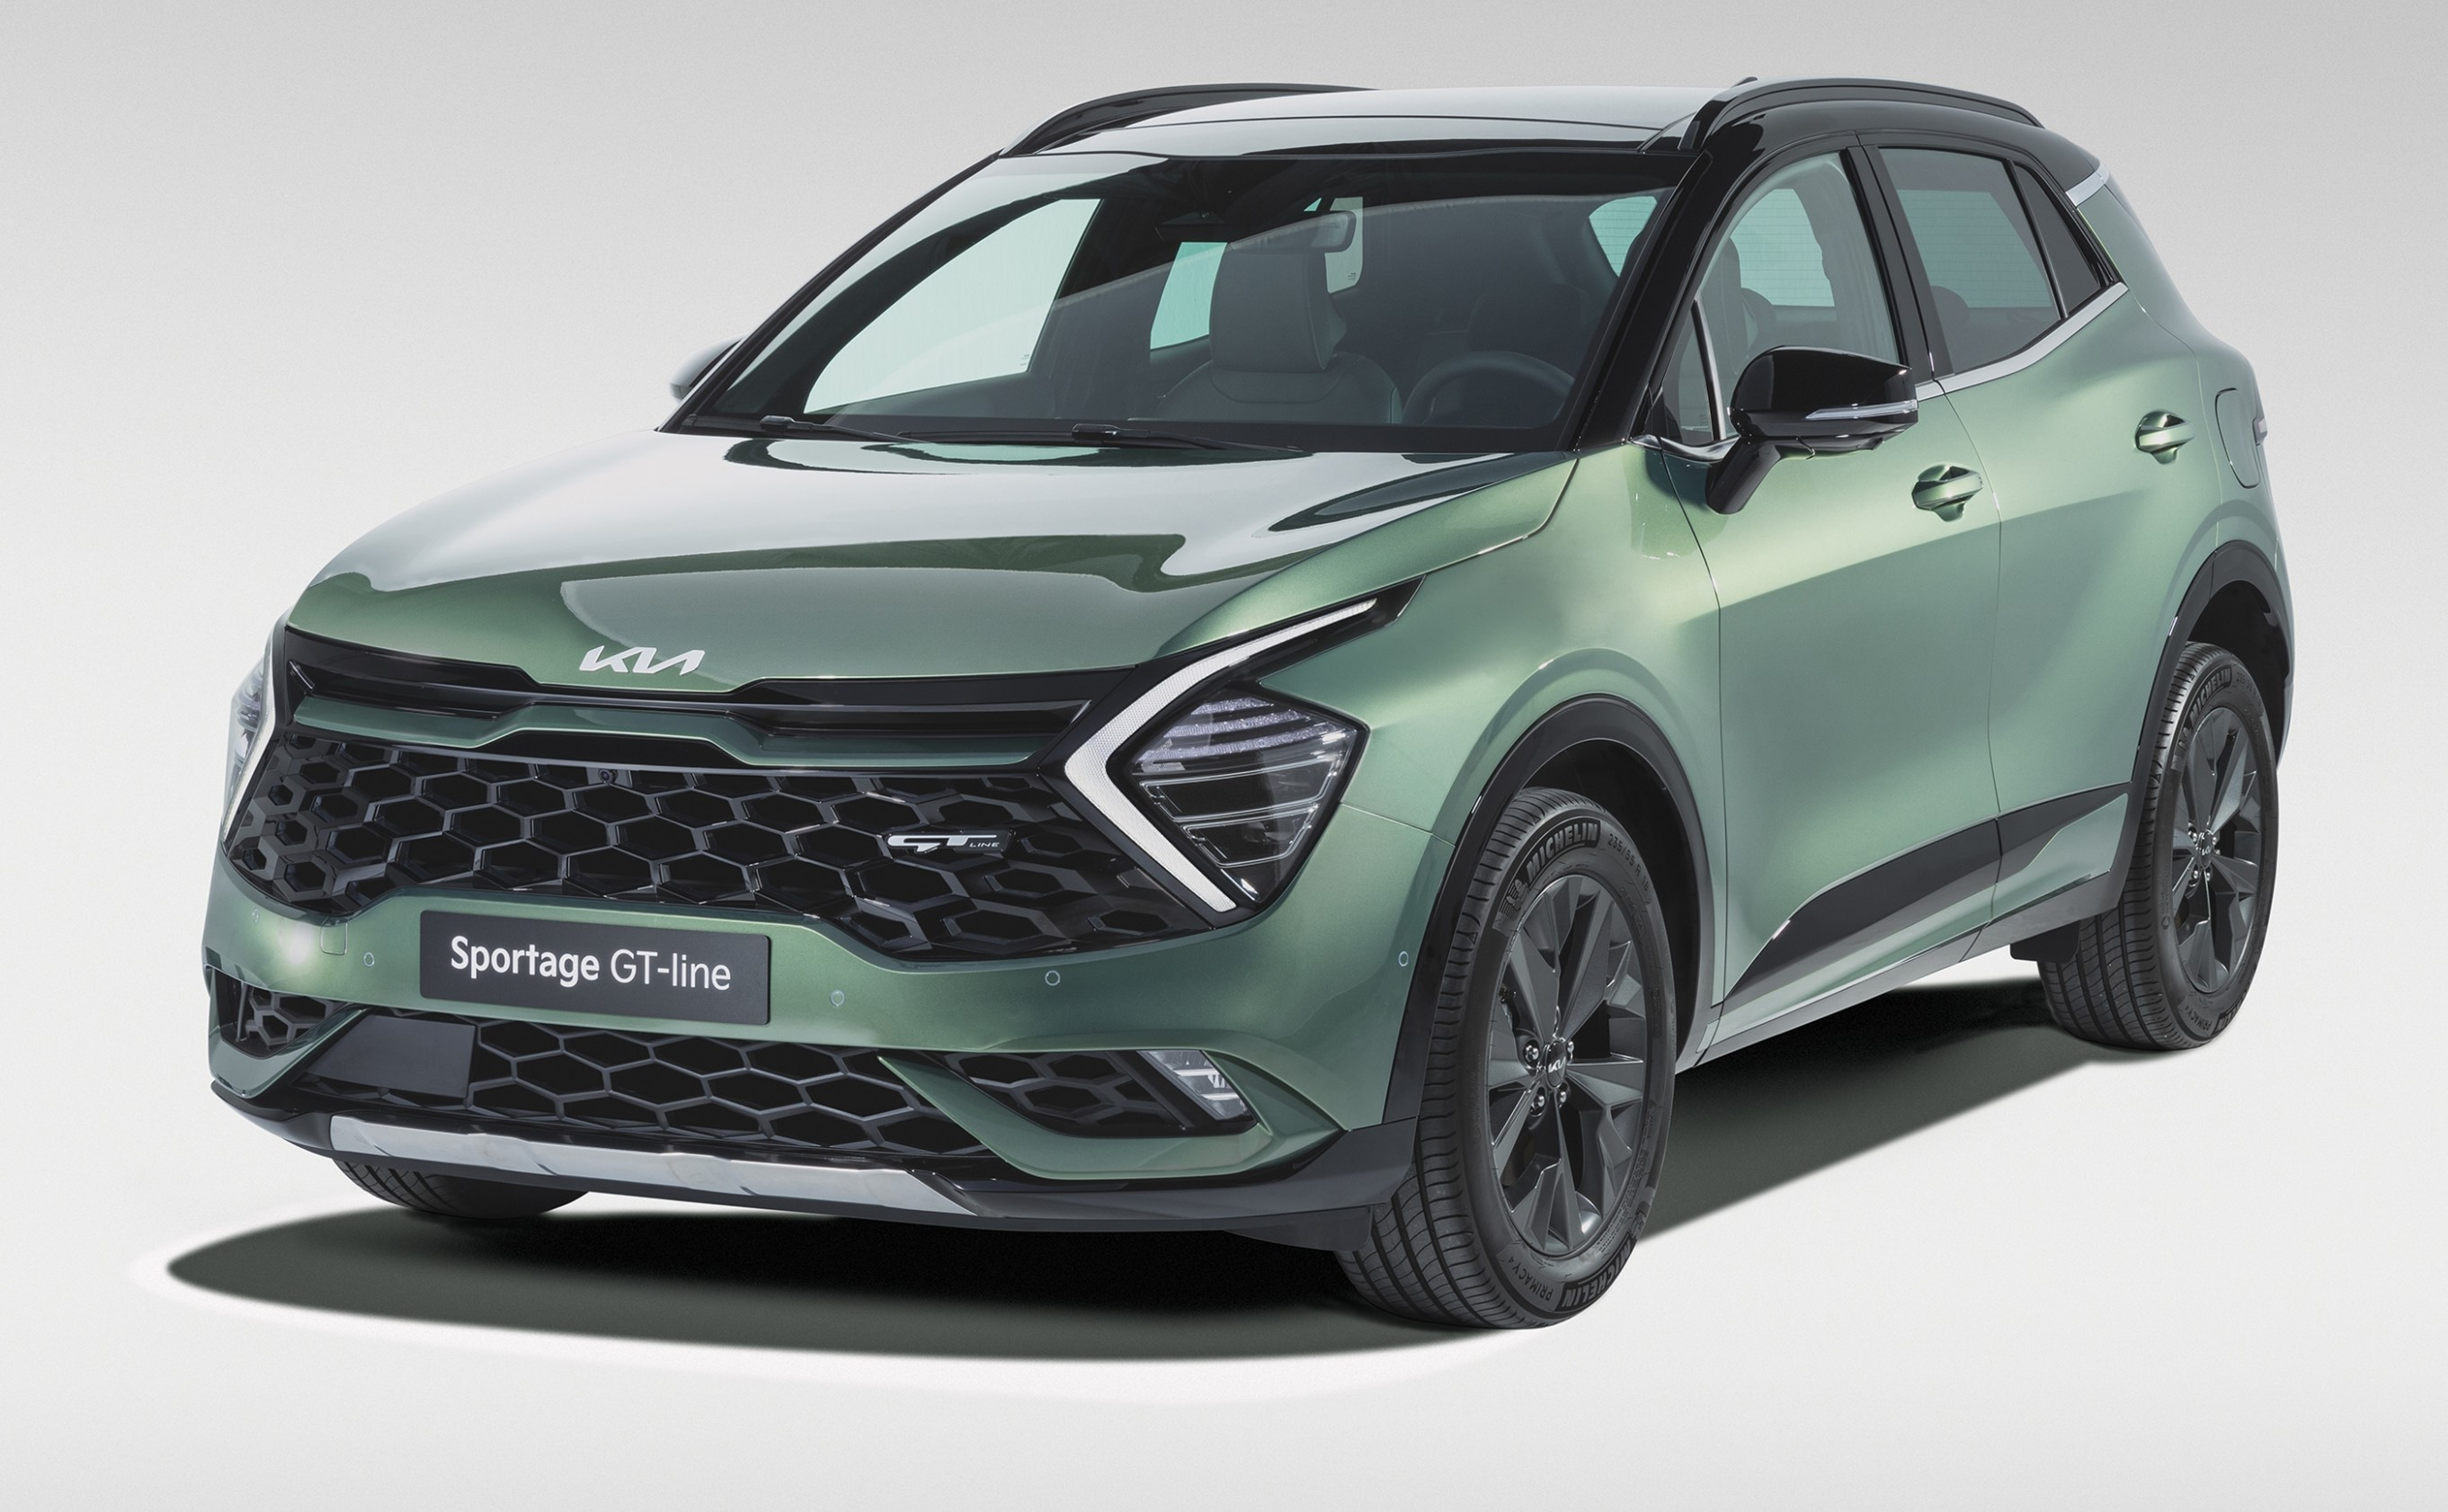 All-new Kia Sportage is revealed